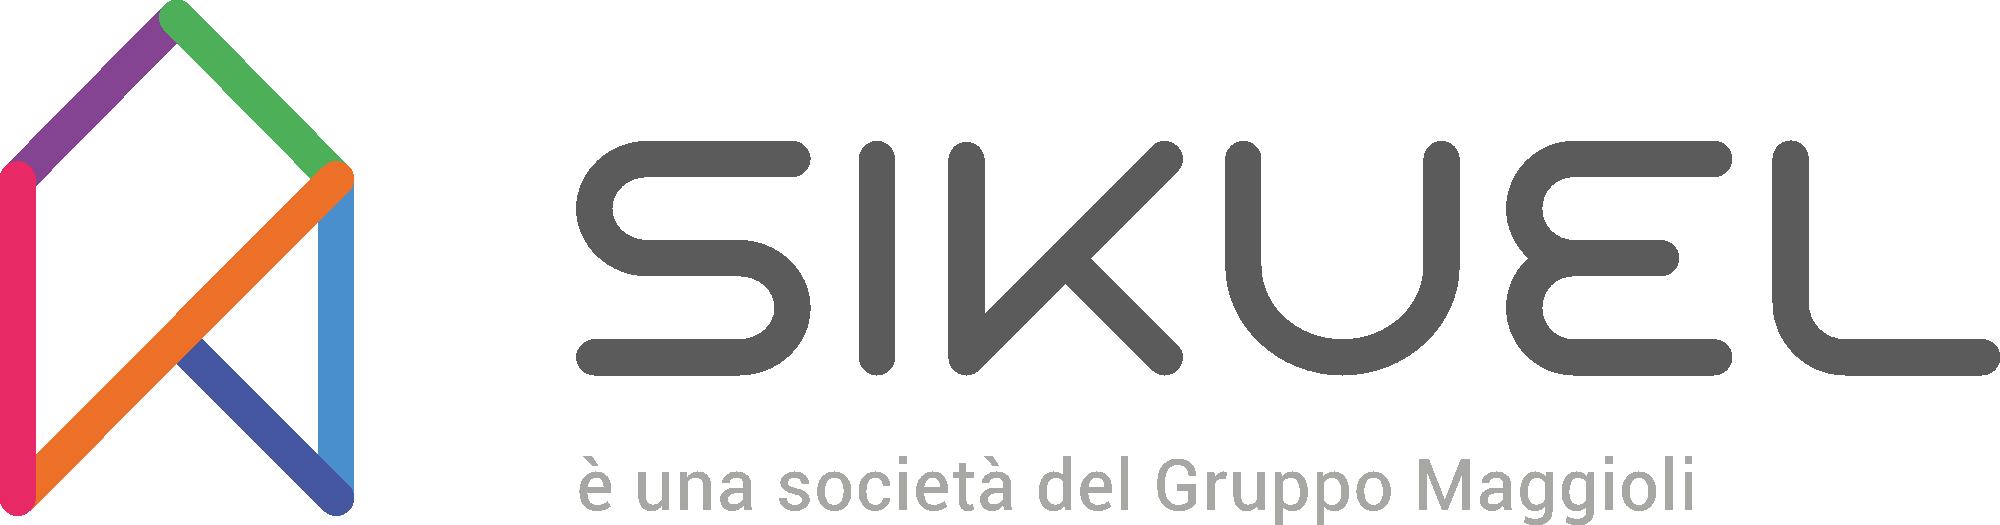 http://www.virtusklebragusa.it/wp-content/uploads/2021/01/sikuel.png